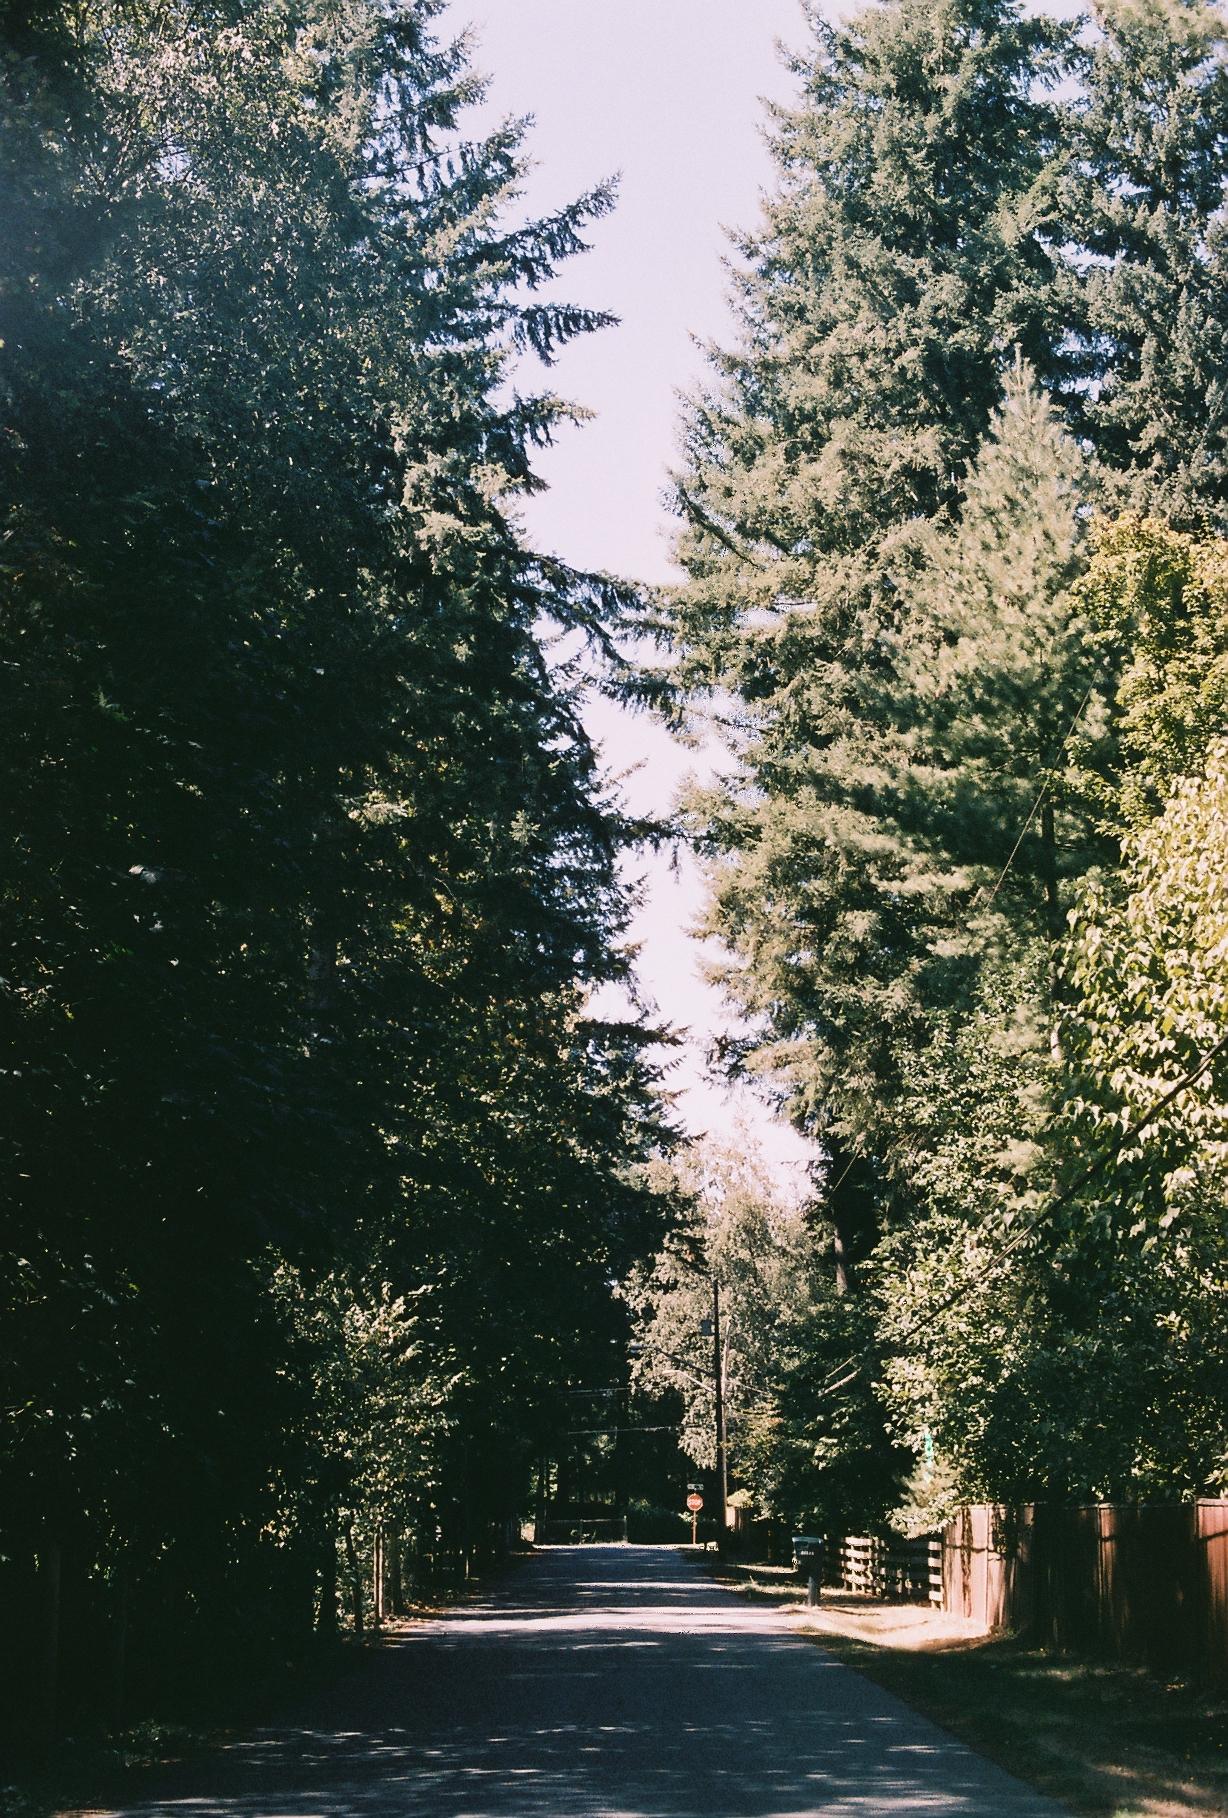 langley, british columbia, canada